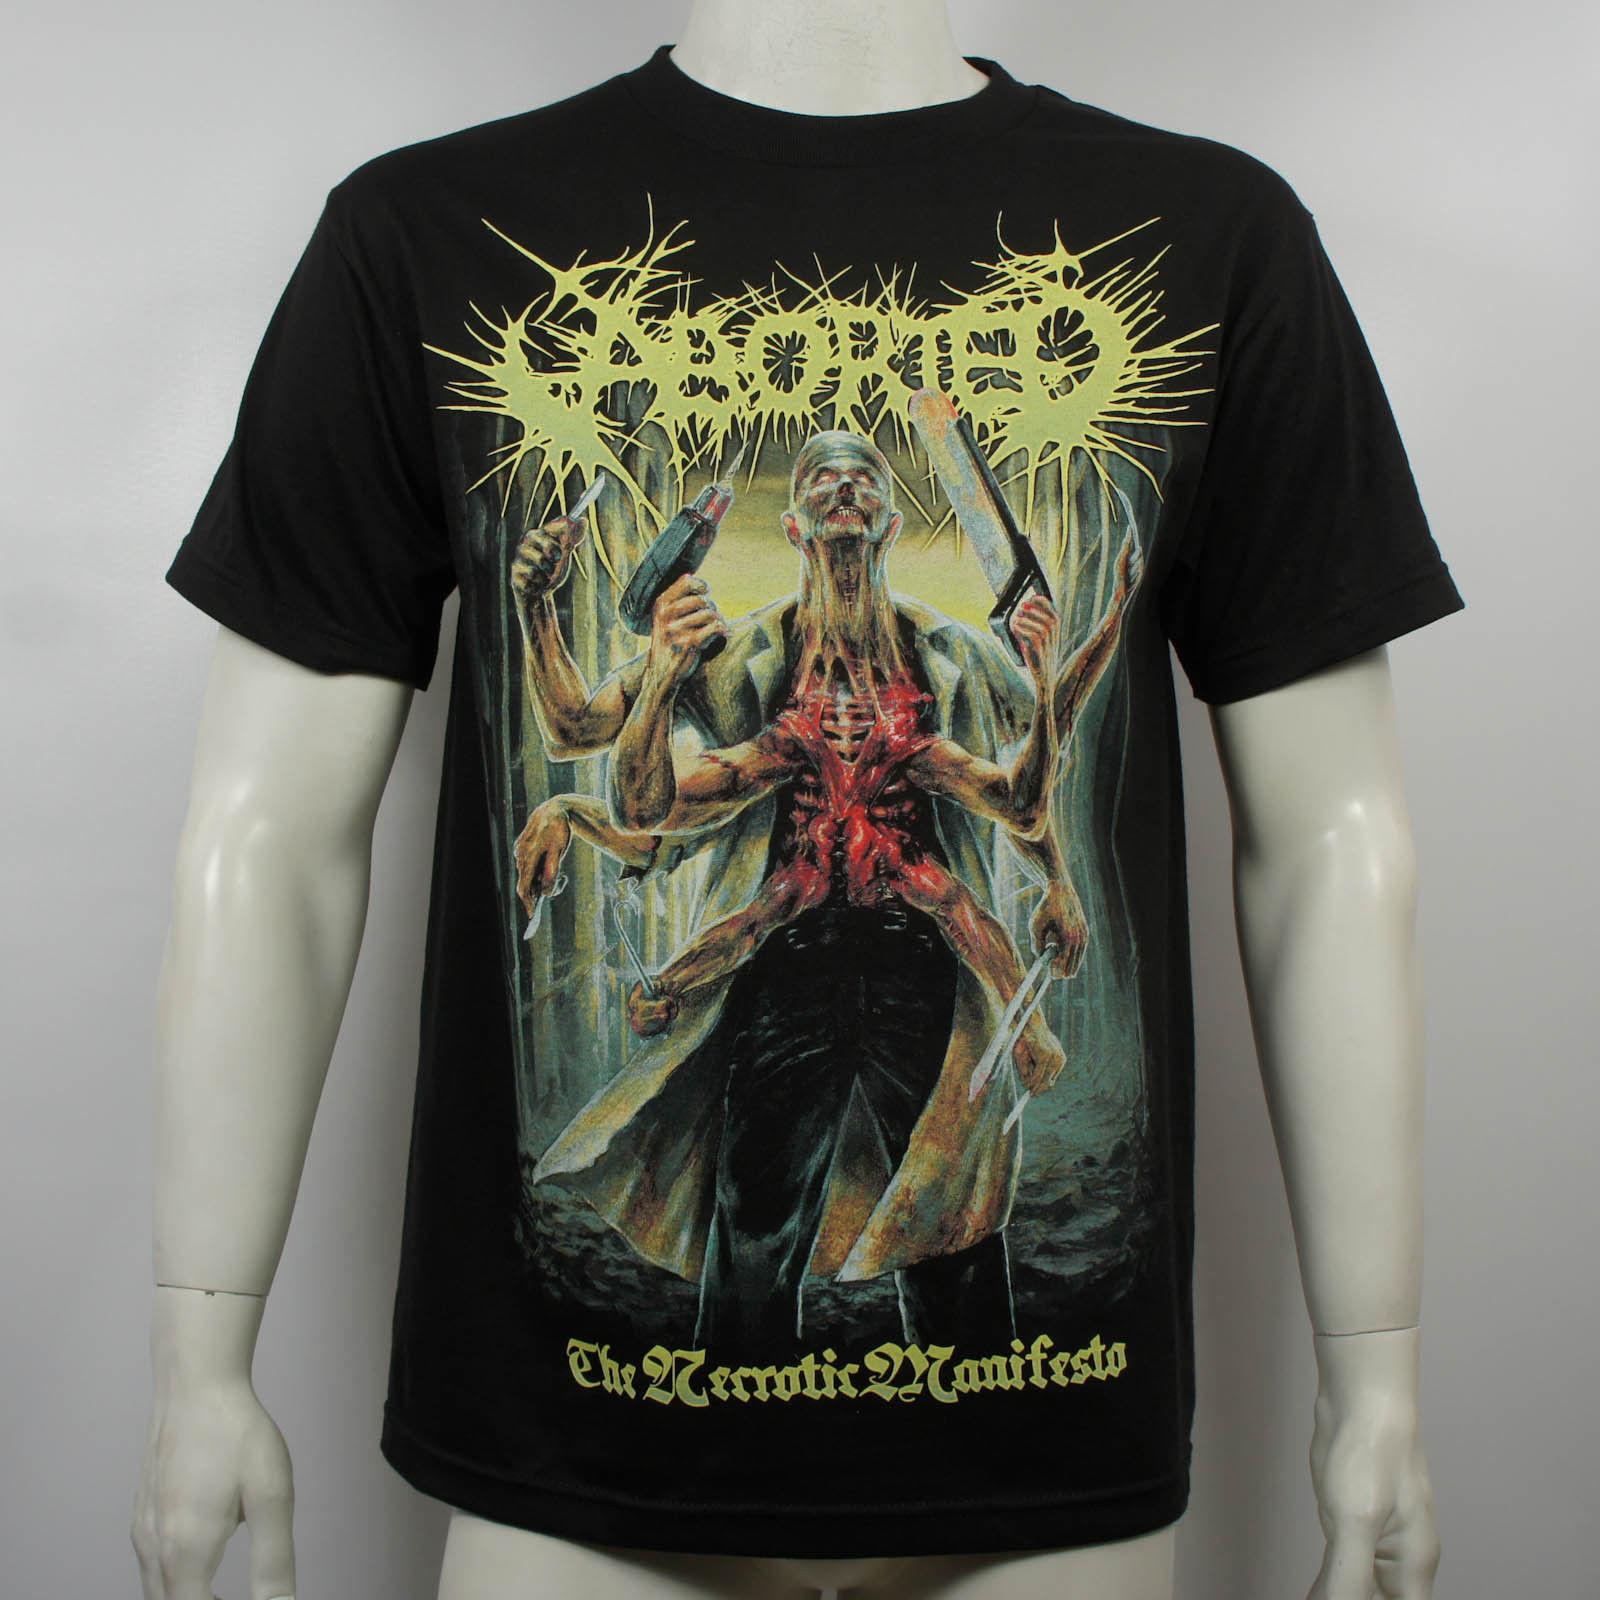 Authentic ABORTED Band Necrotic Manifesto Album Cover Art Logo T-Shirt S-3XL NEW Black Cotton T Shirt Top Tee PLUS SIZE